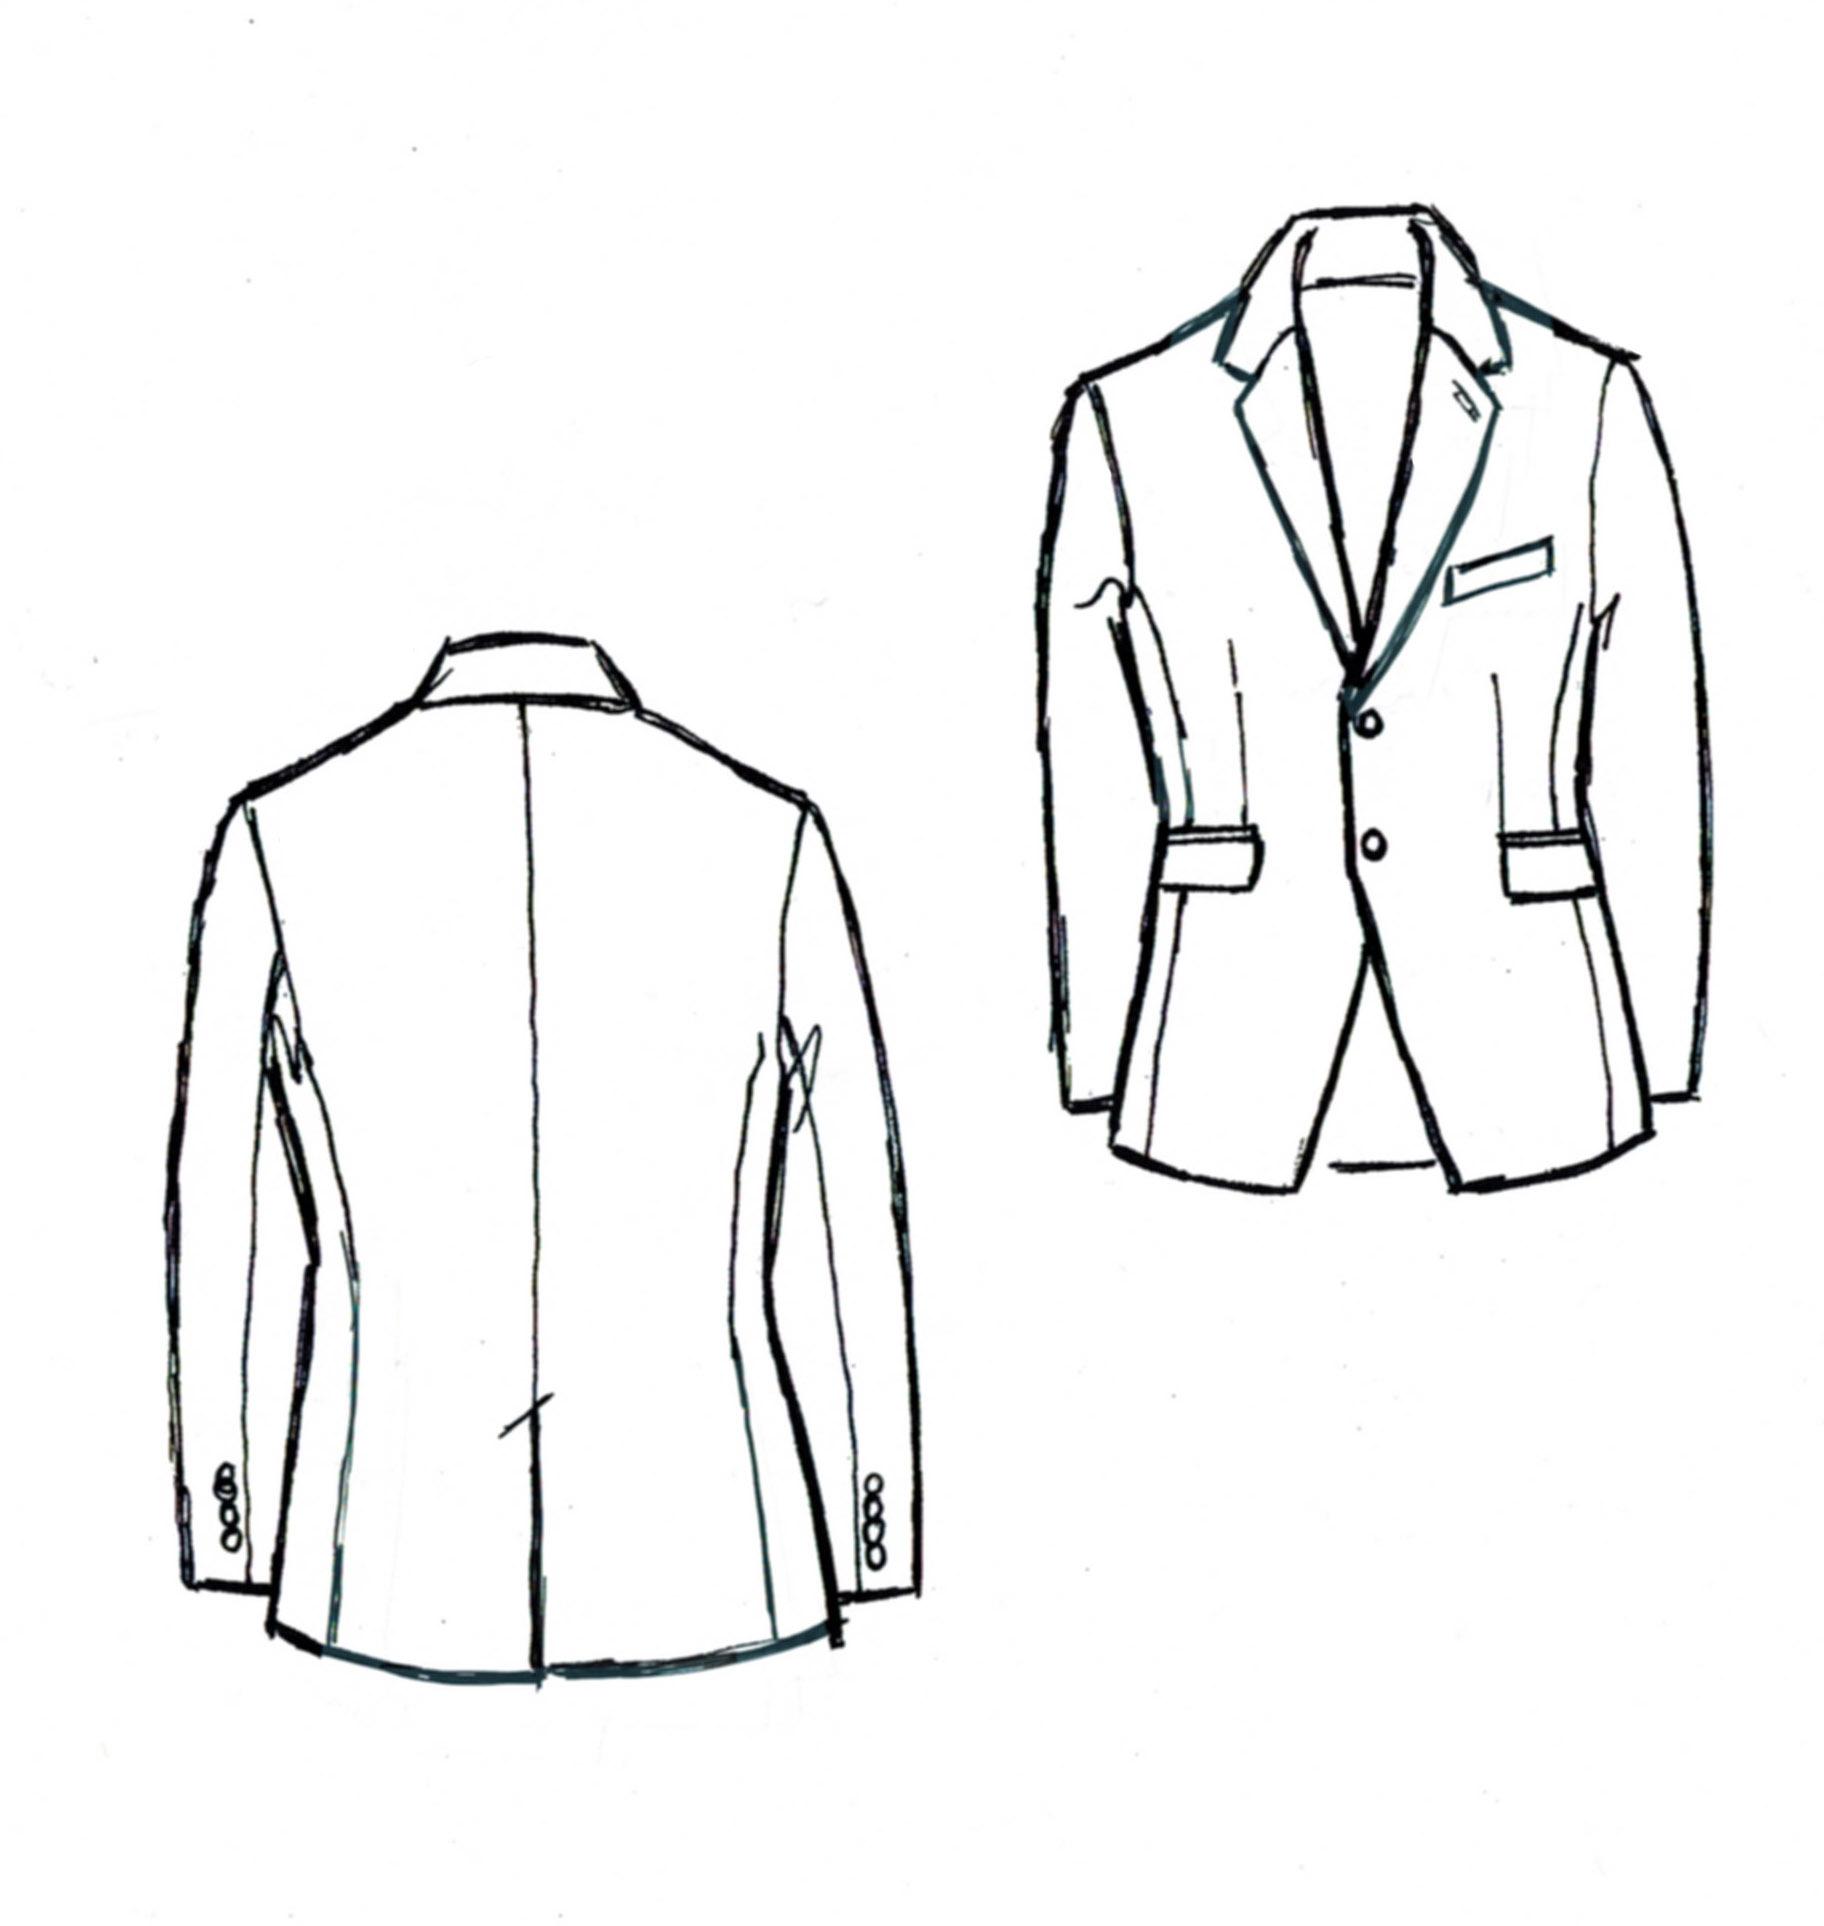 Patch Pocket Suit Denver Bespoke Custom Tailored Suits